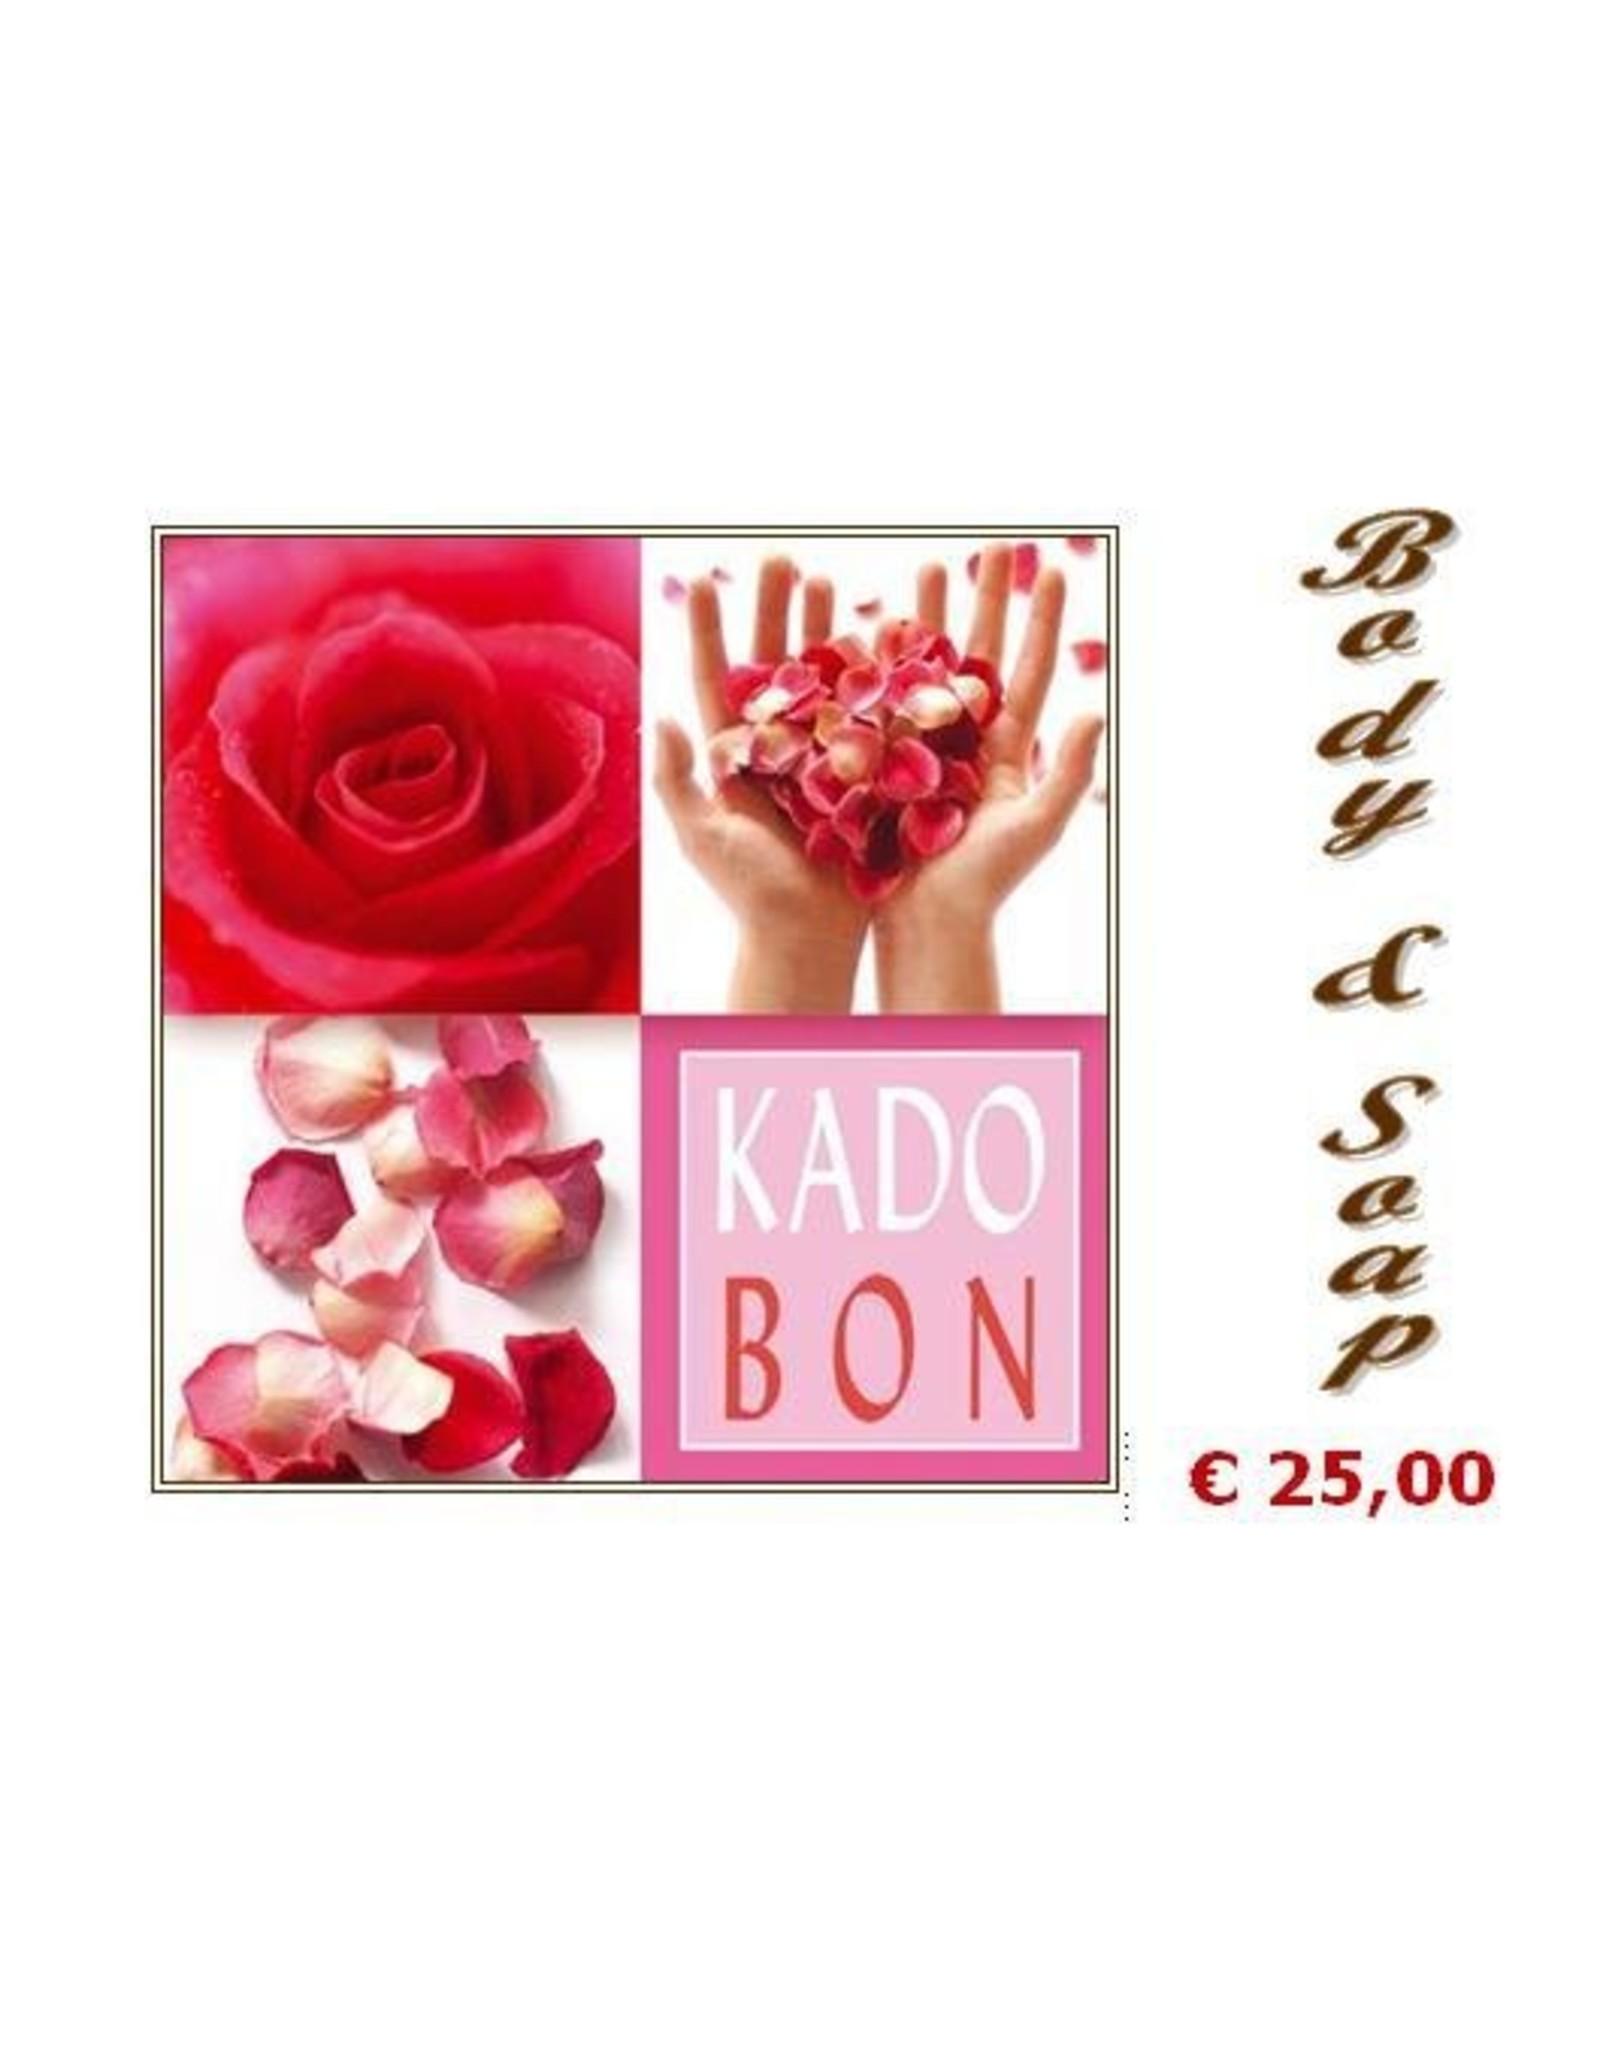 Cadeaubonnen - Body & Soap